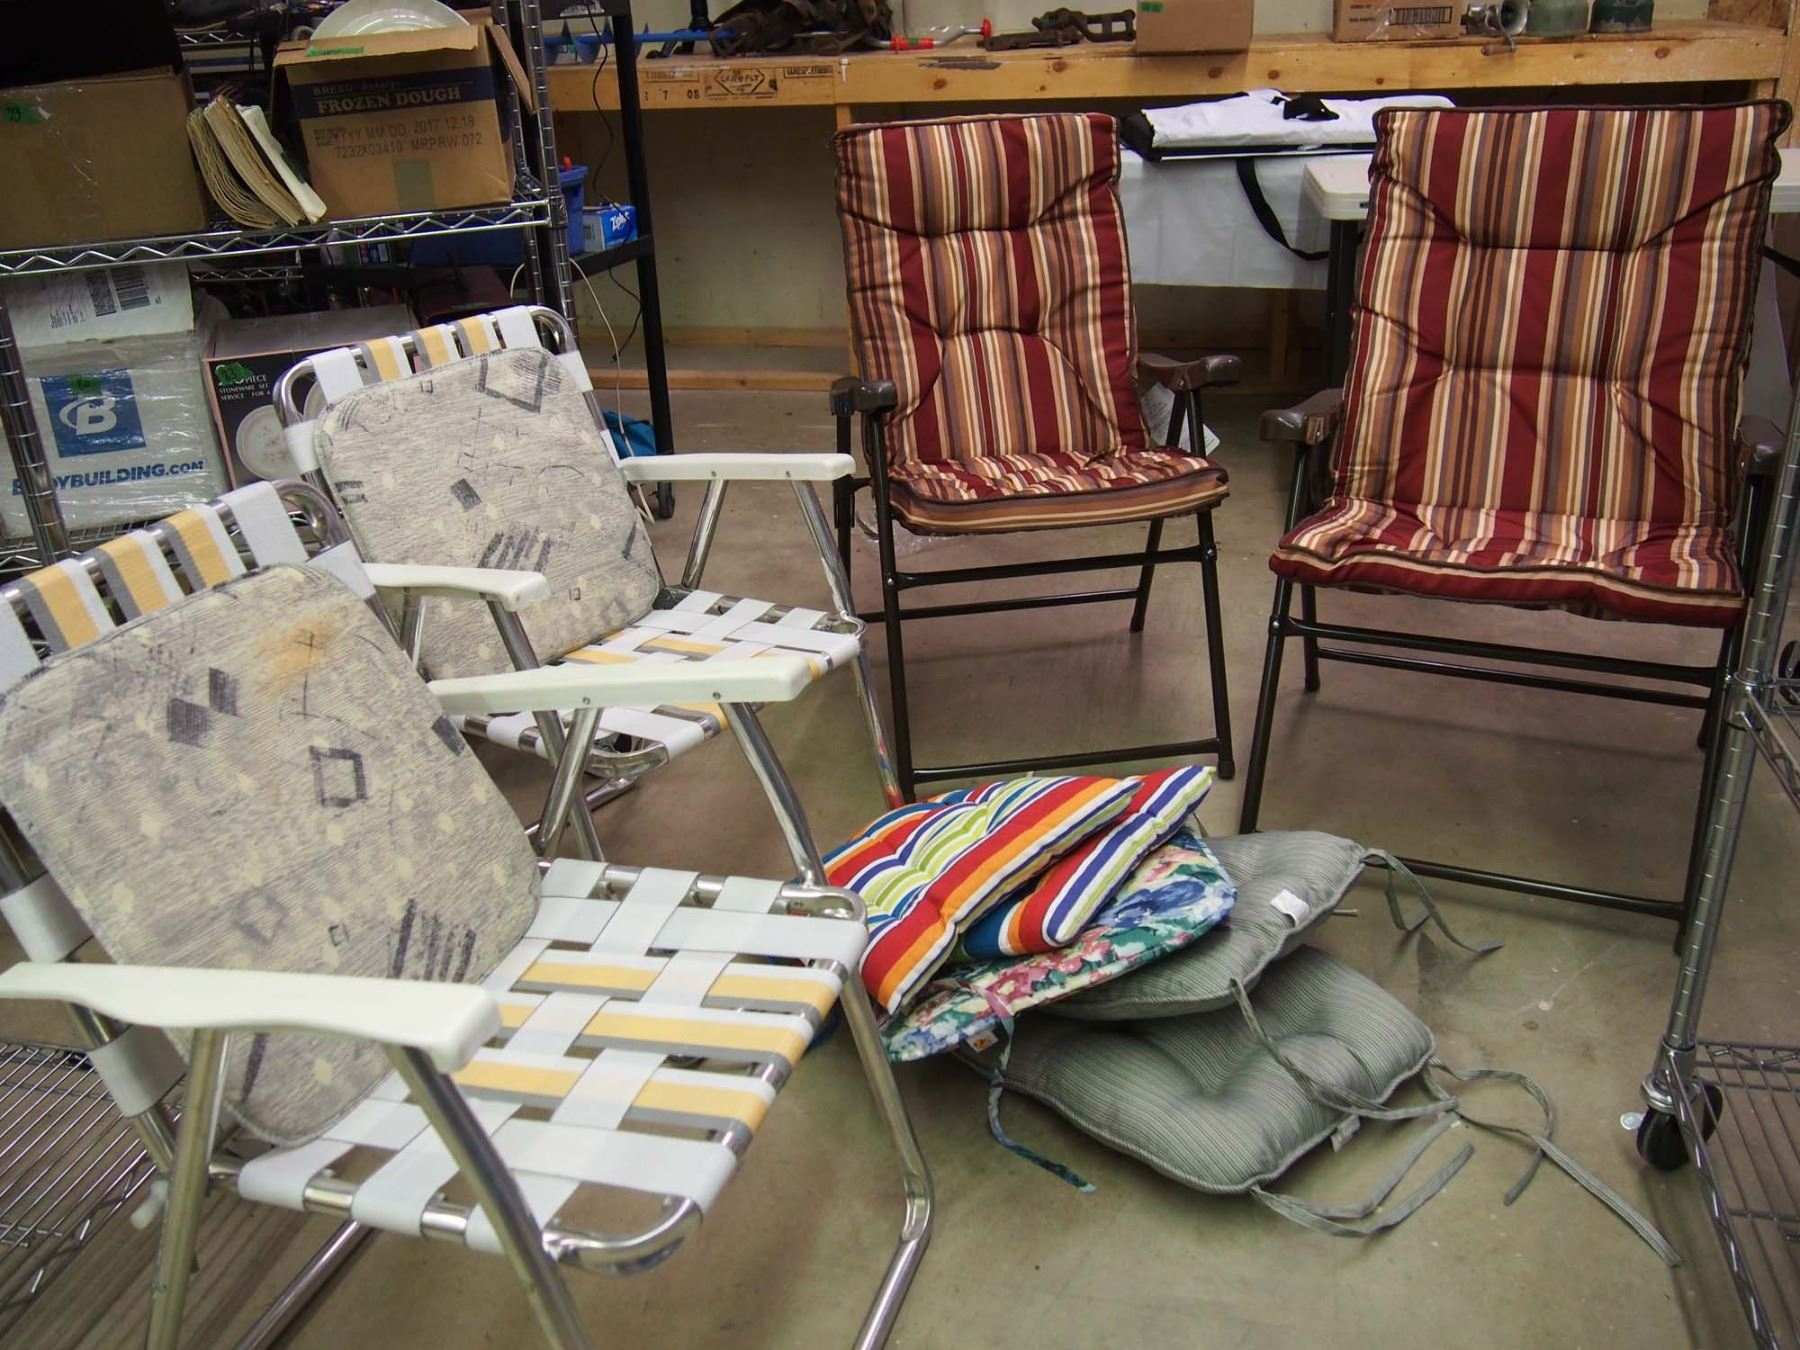 Image 1 Folding Patio Chairs 4 W Cushions